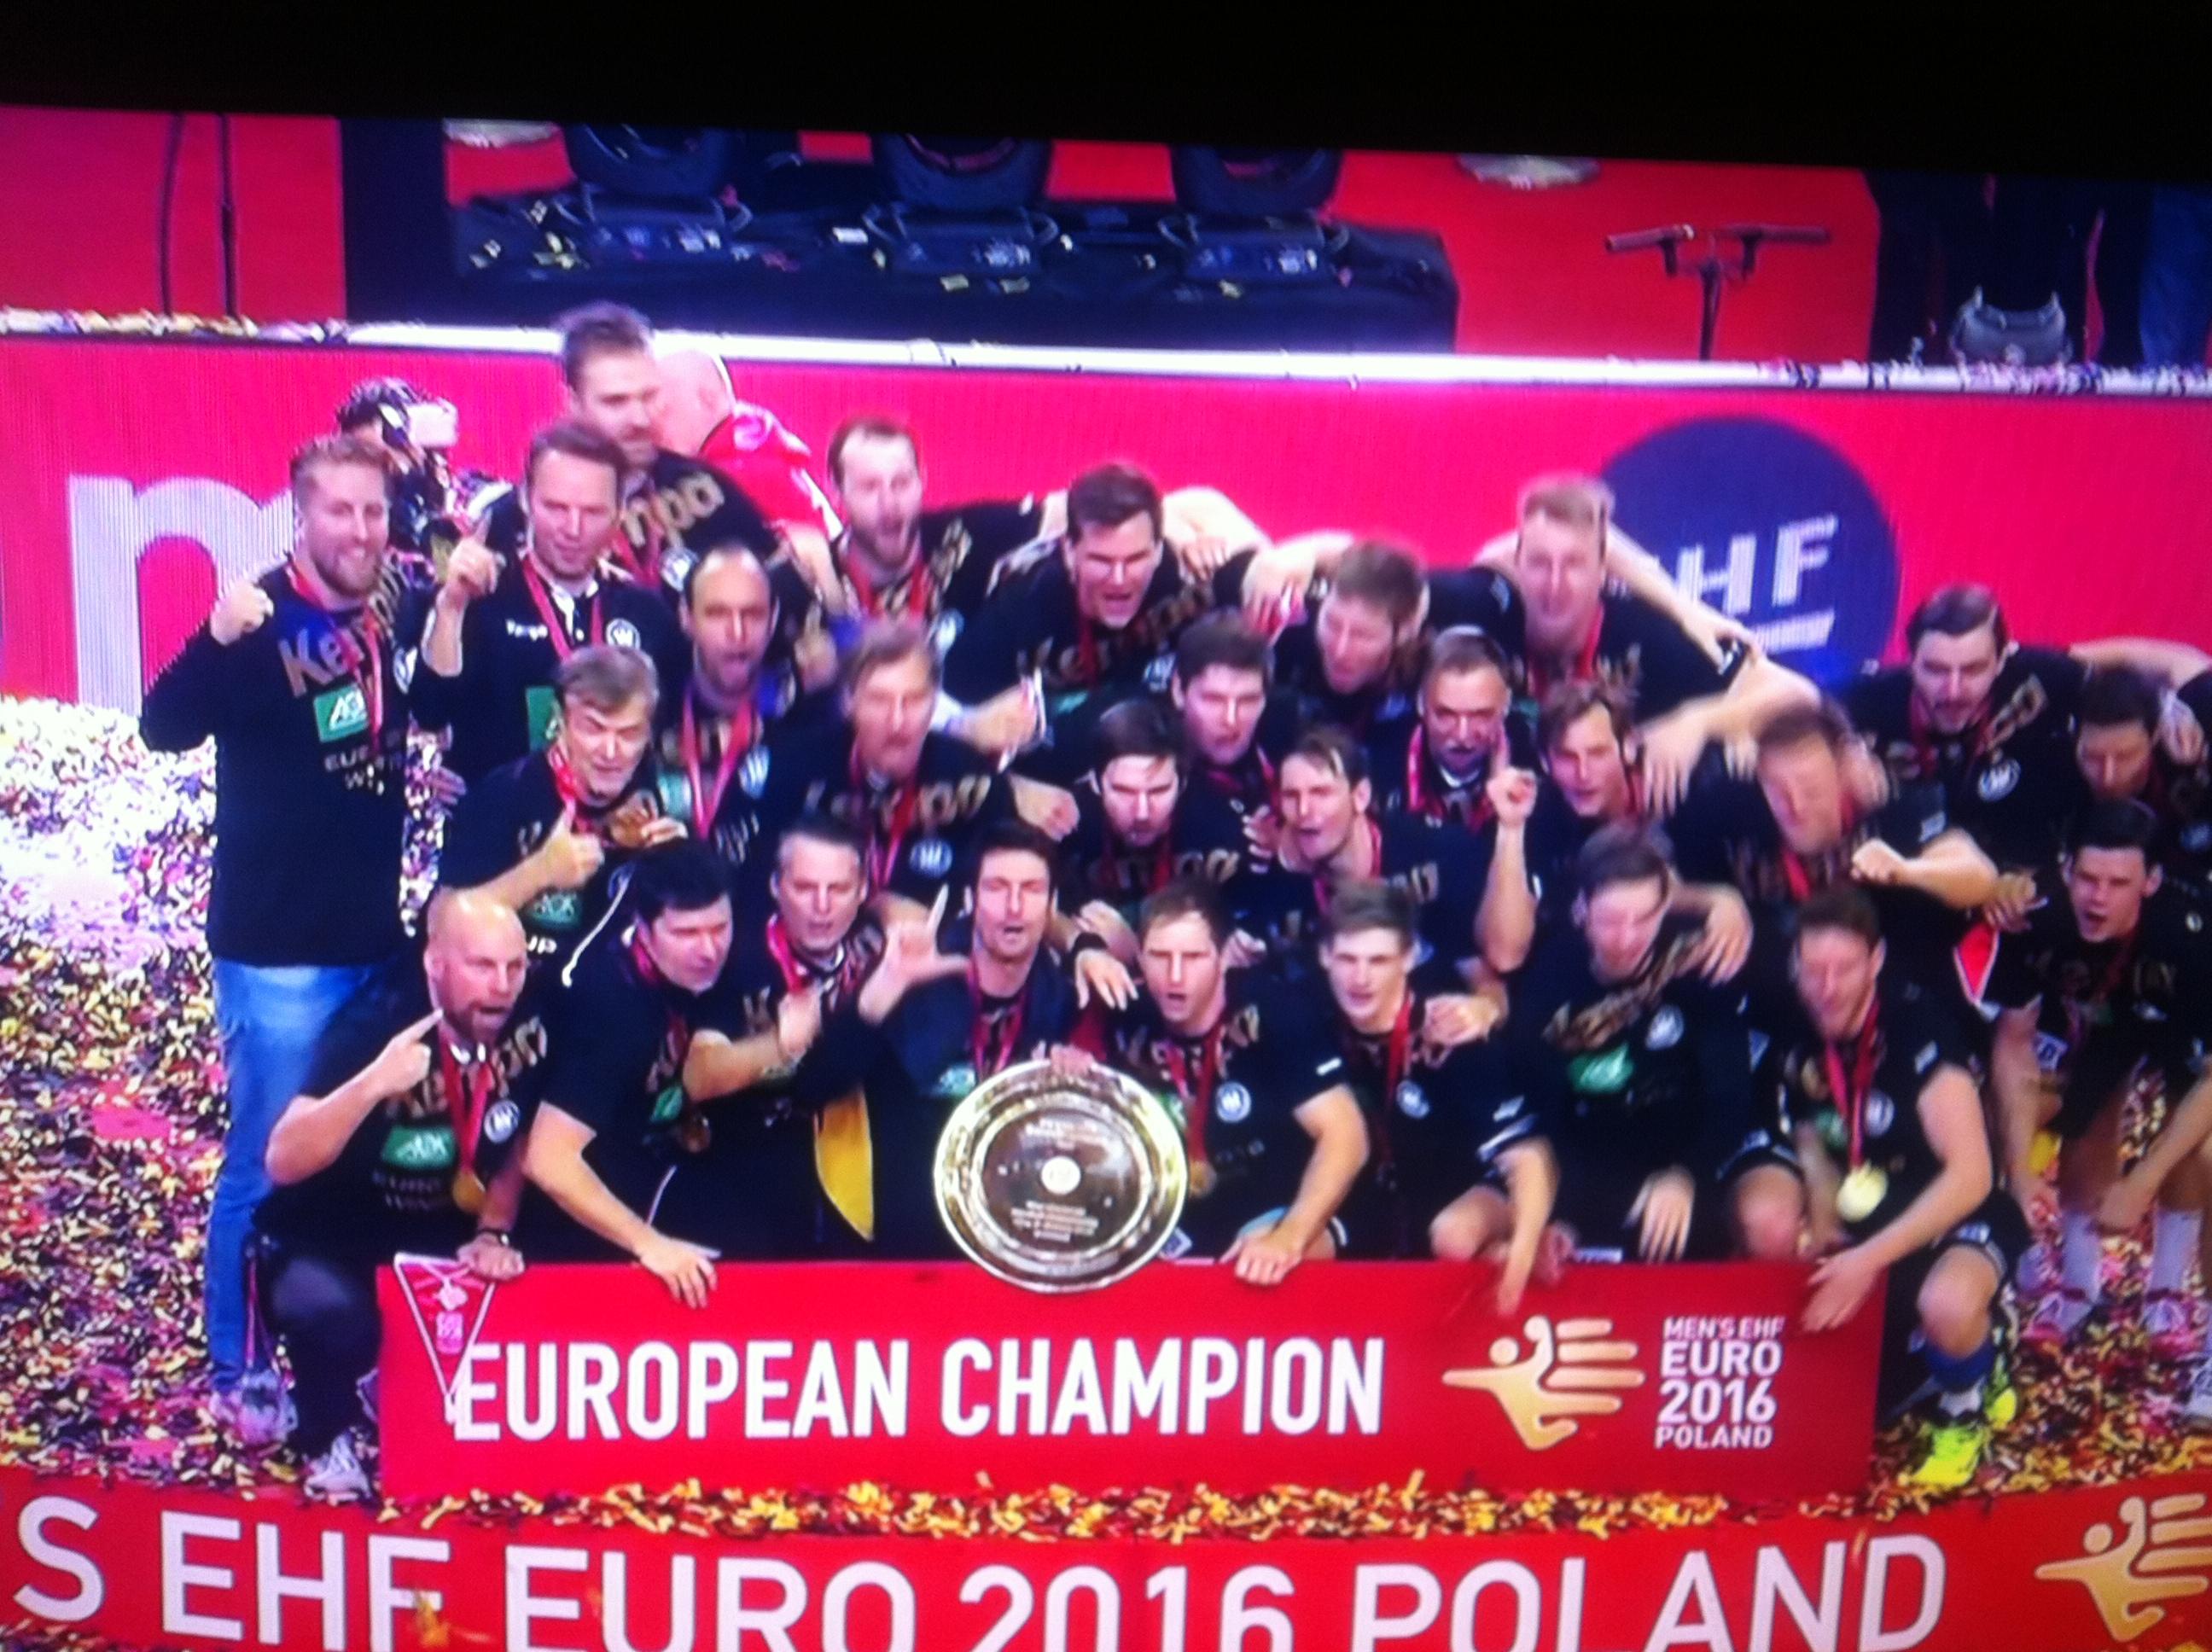 Handball Europameister 2016! Die Sensation ist perfekt!